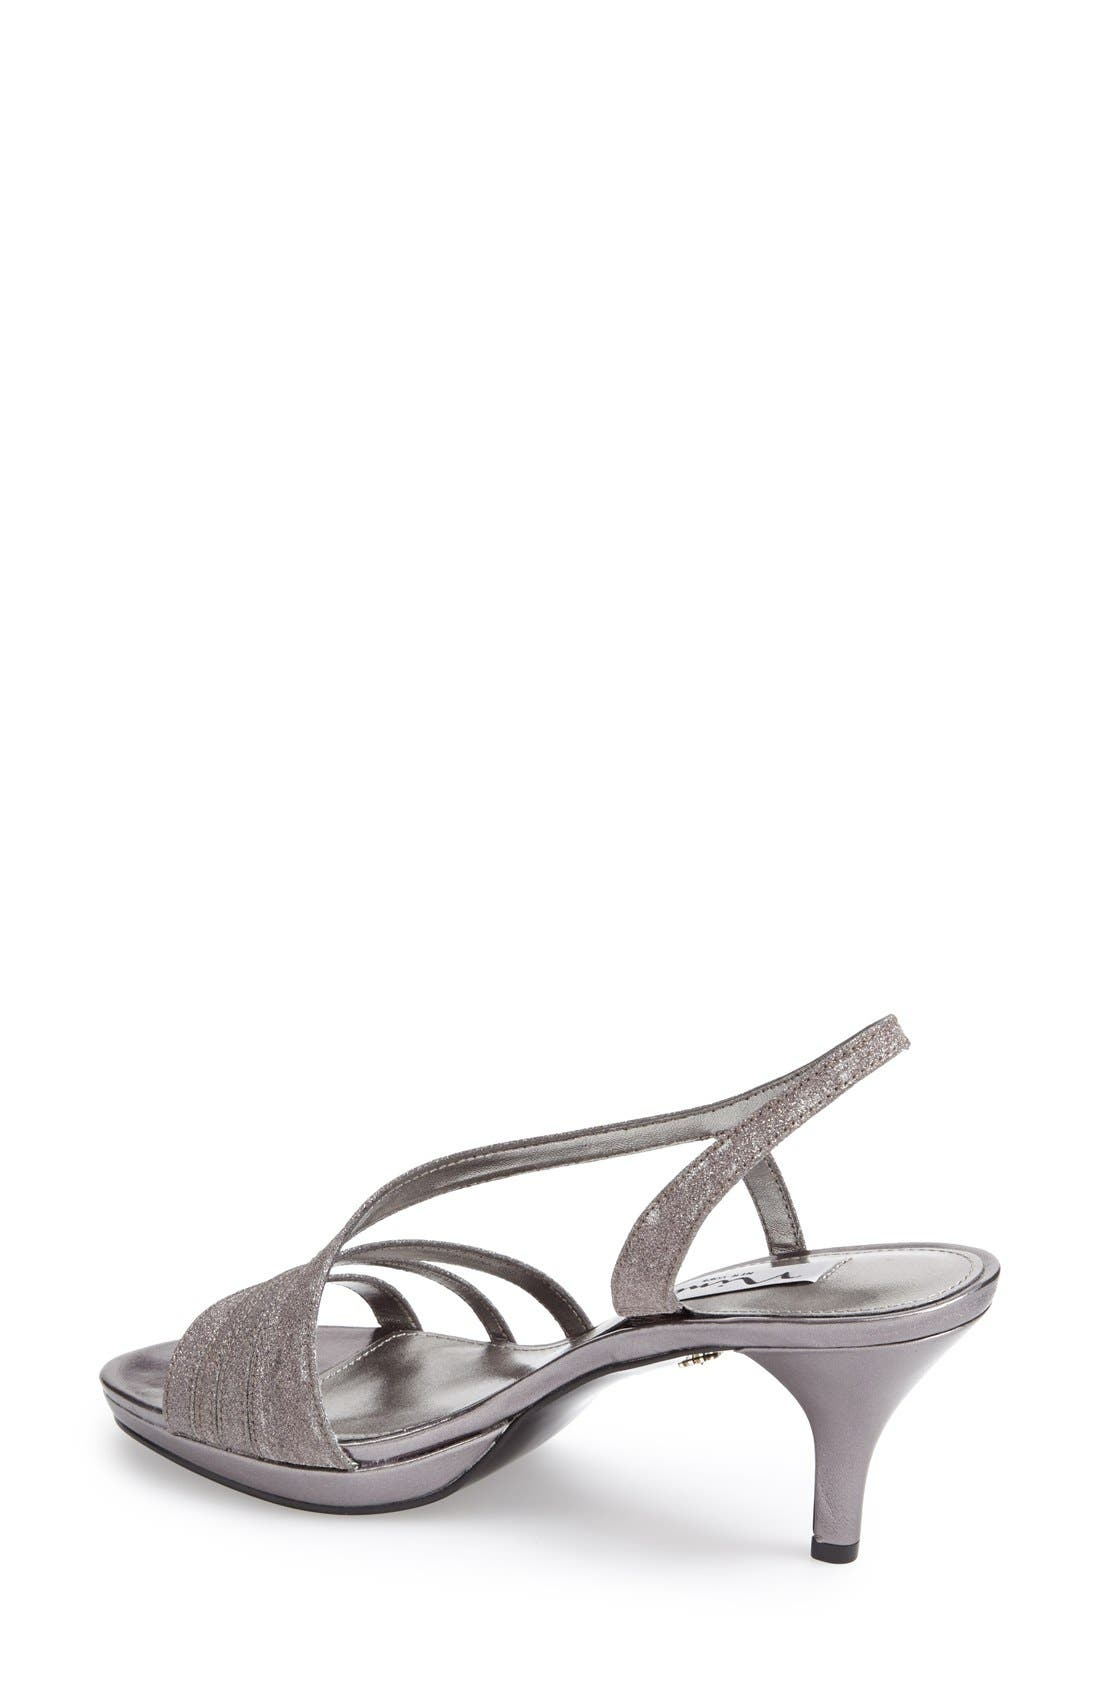 'Neely' Slingback Platform Sandal,                             Alternate thumbnail 3, color,                             CHARCOAL